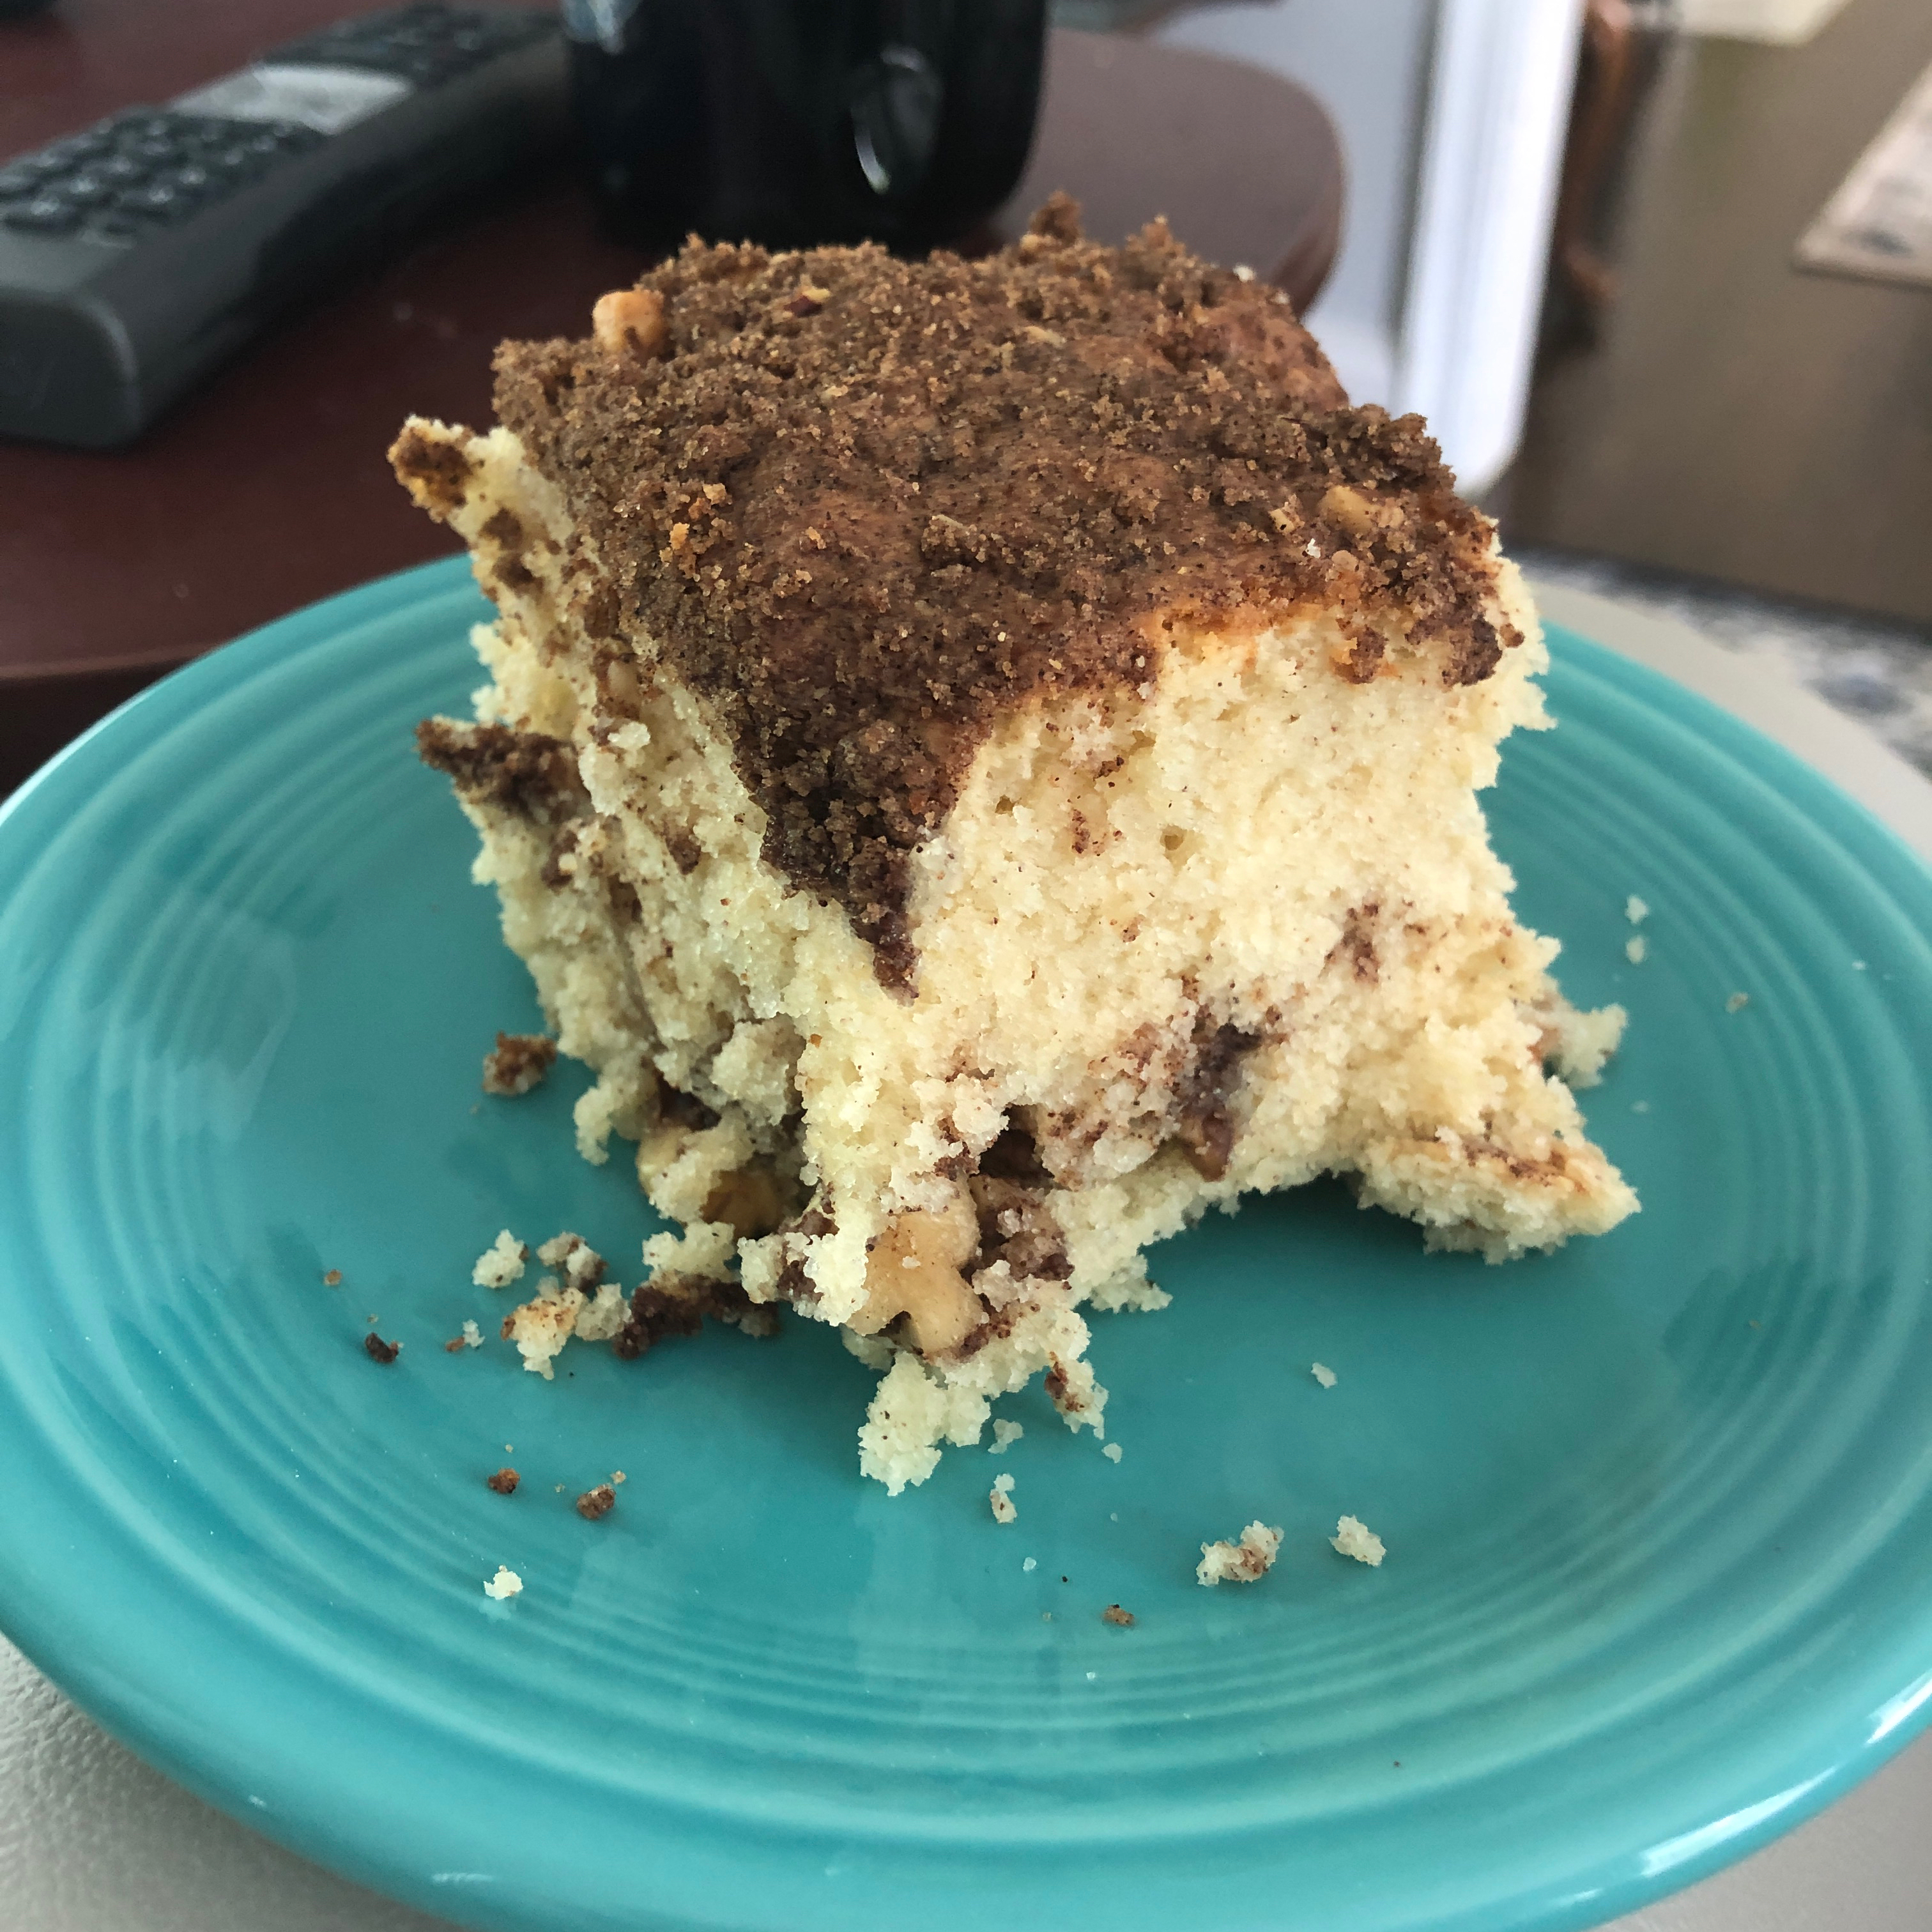 Cinnamon-Laced Coffee Cake